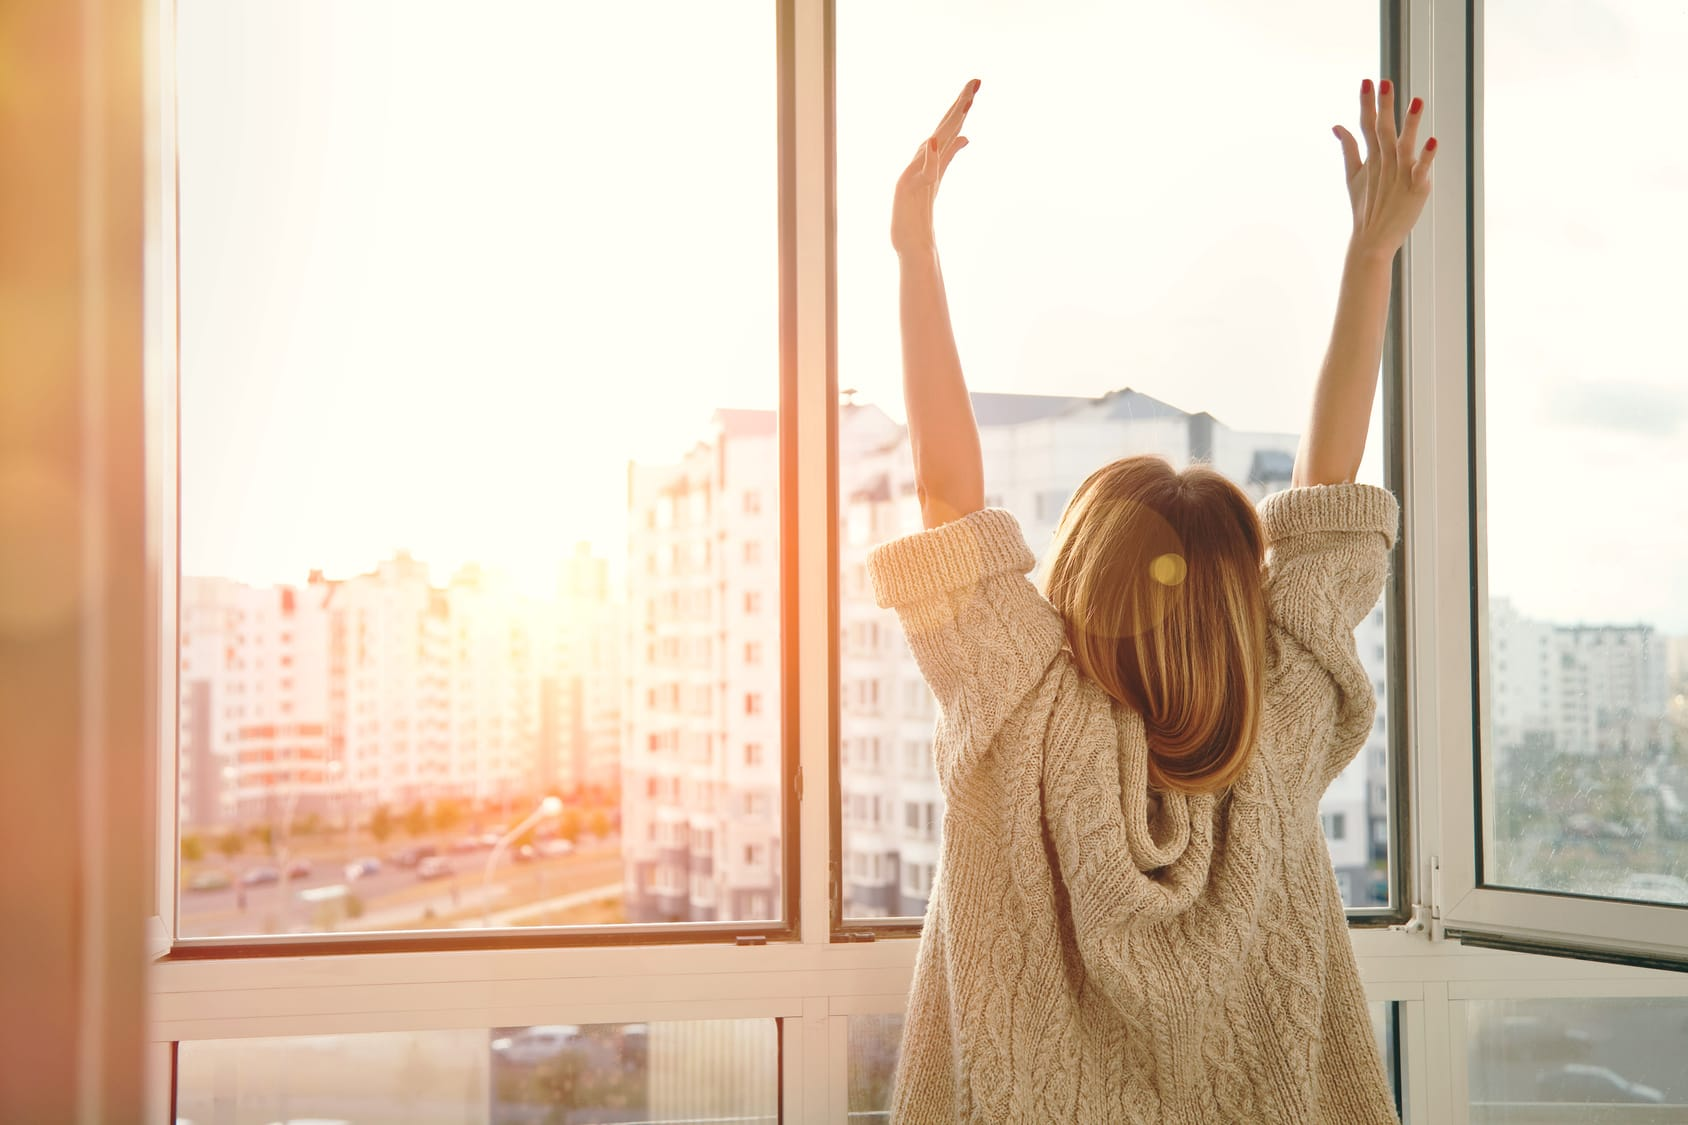 Schimmel vorbeugen – 5 Tipps & Tricks